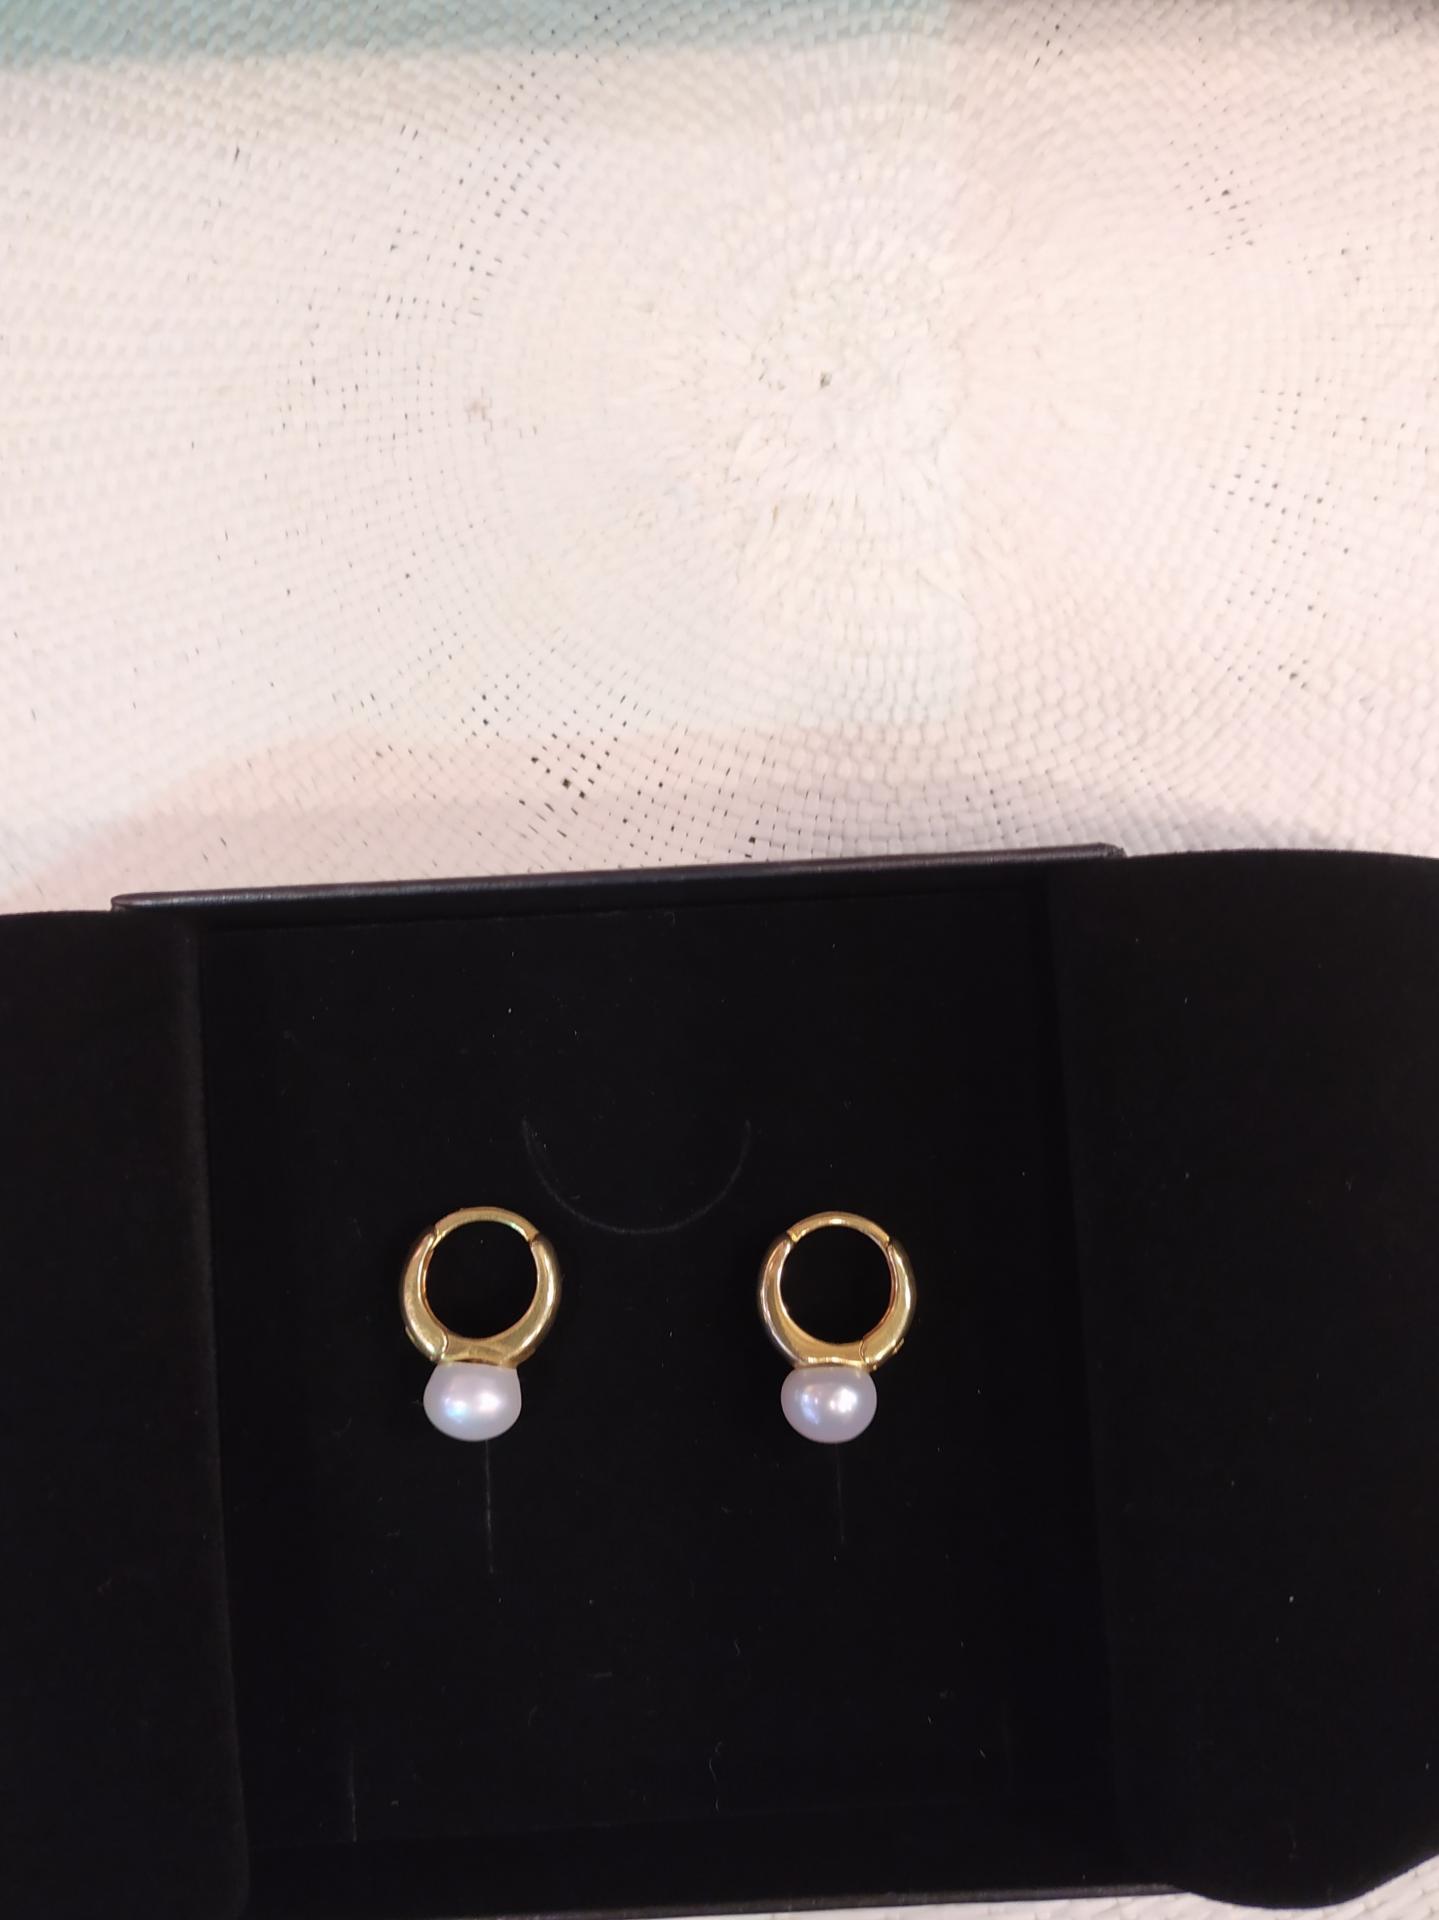 Bo avec perles de cultures 49 eur 4 79 gr perles diam entre 8 a 9 mm